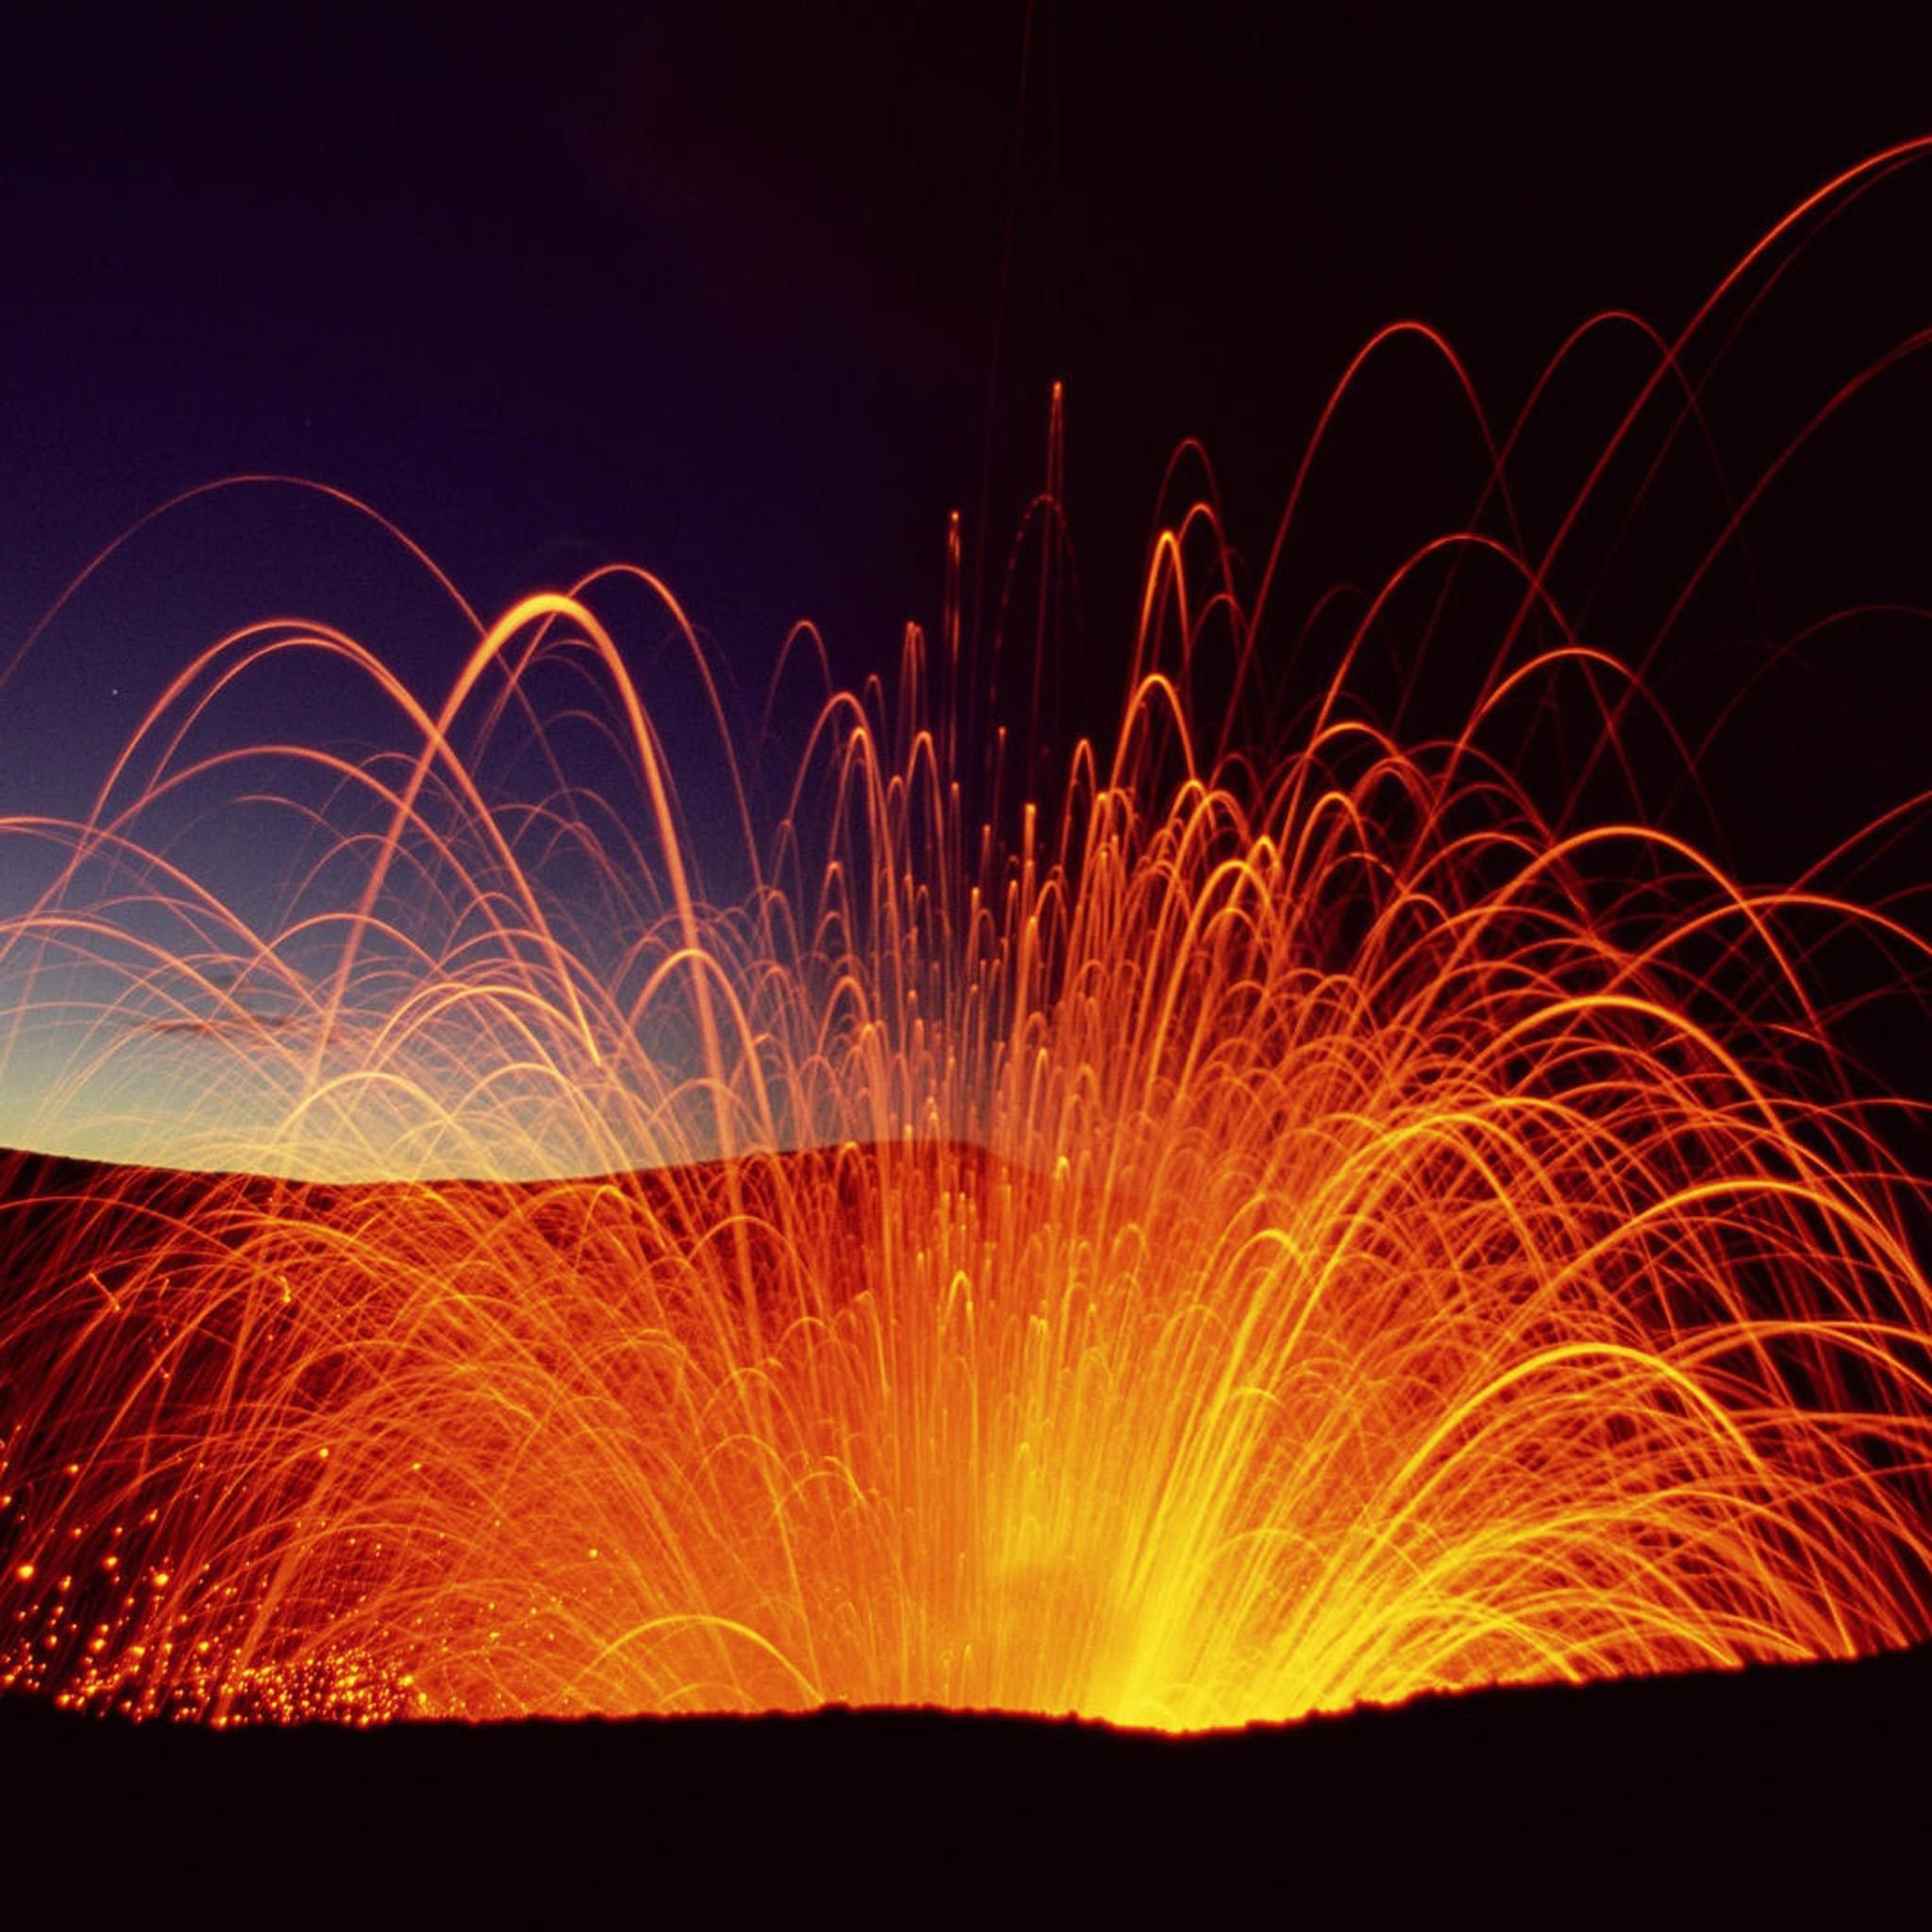 #Fire and #Lava at night! #ipad #retina #wallpaper